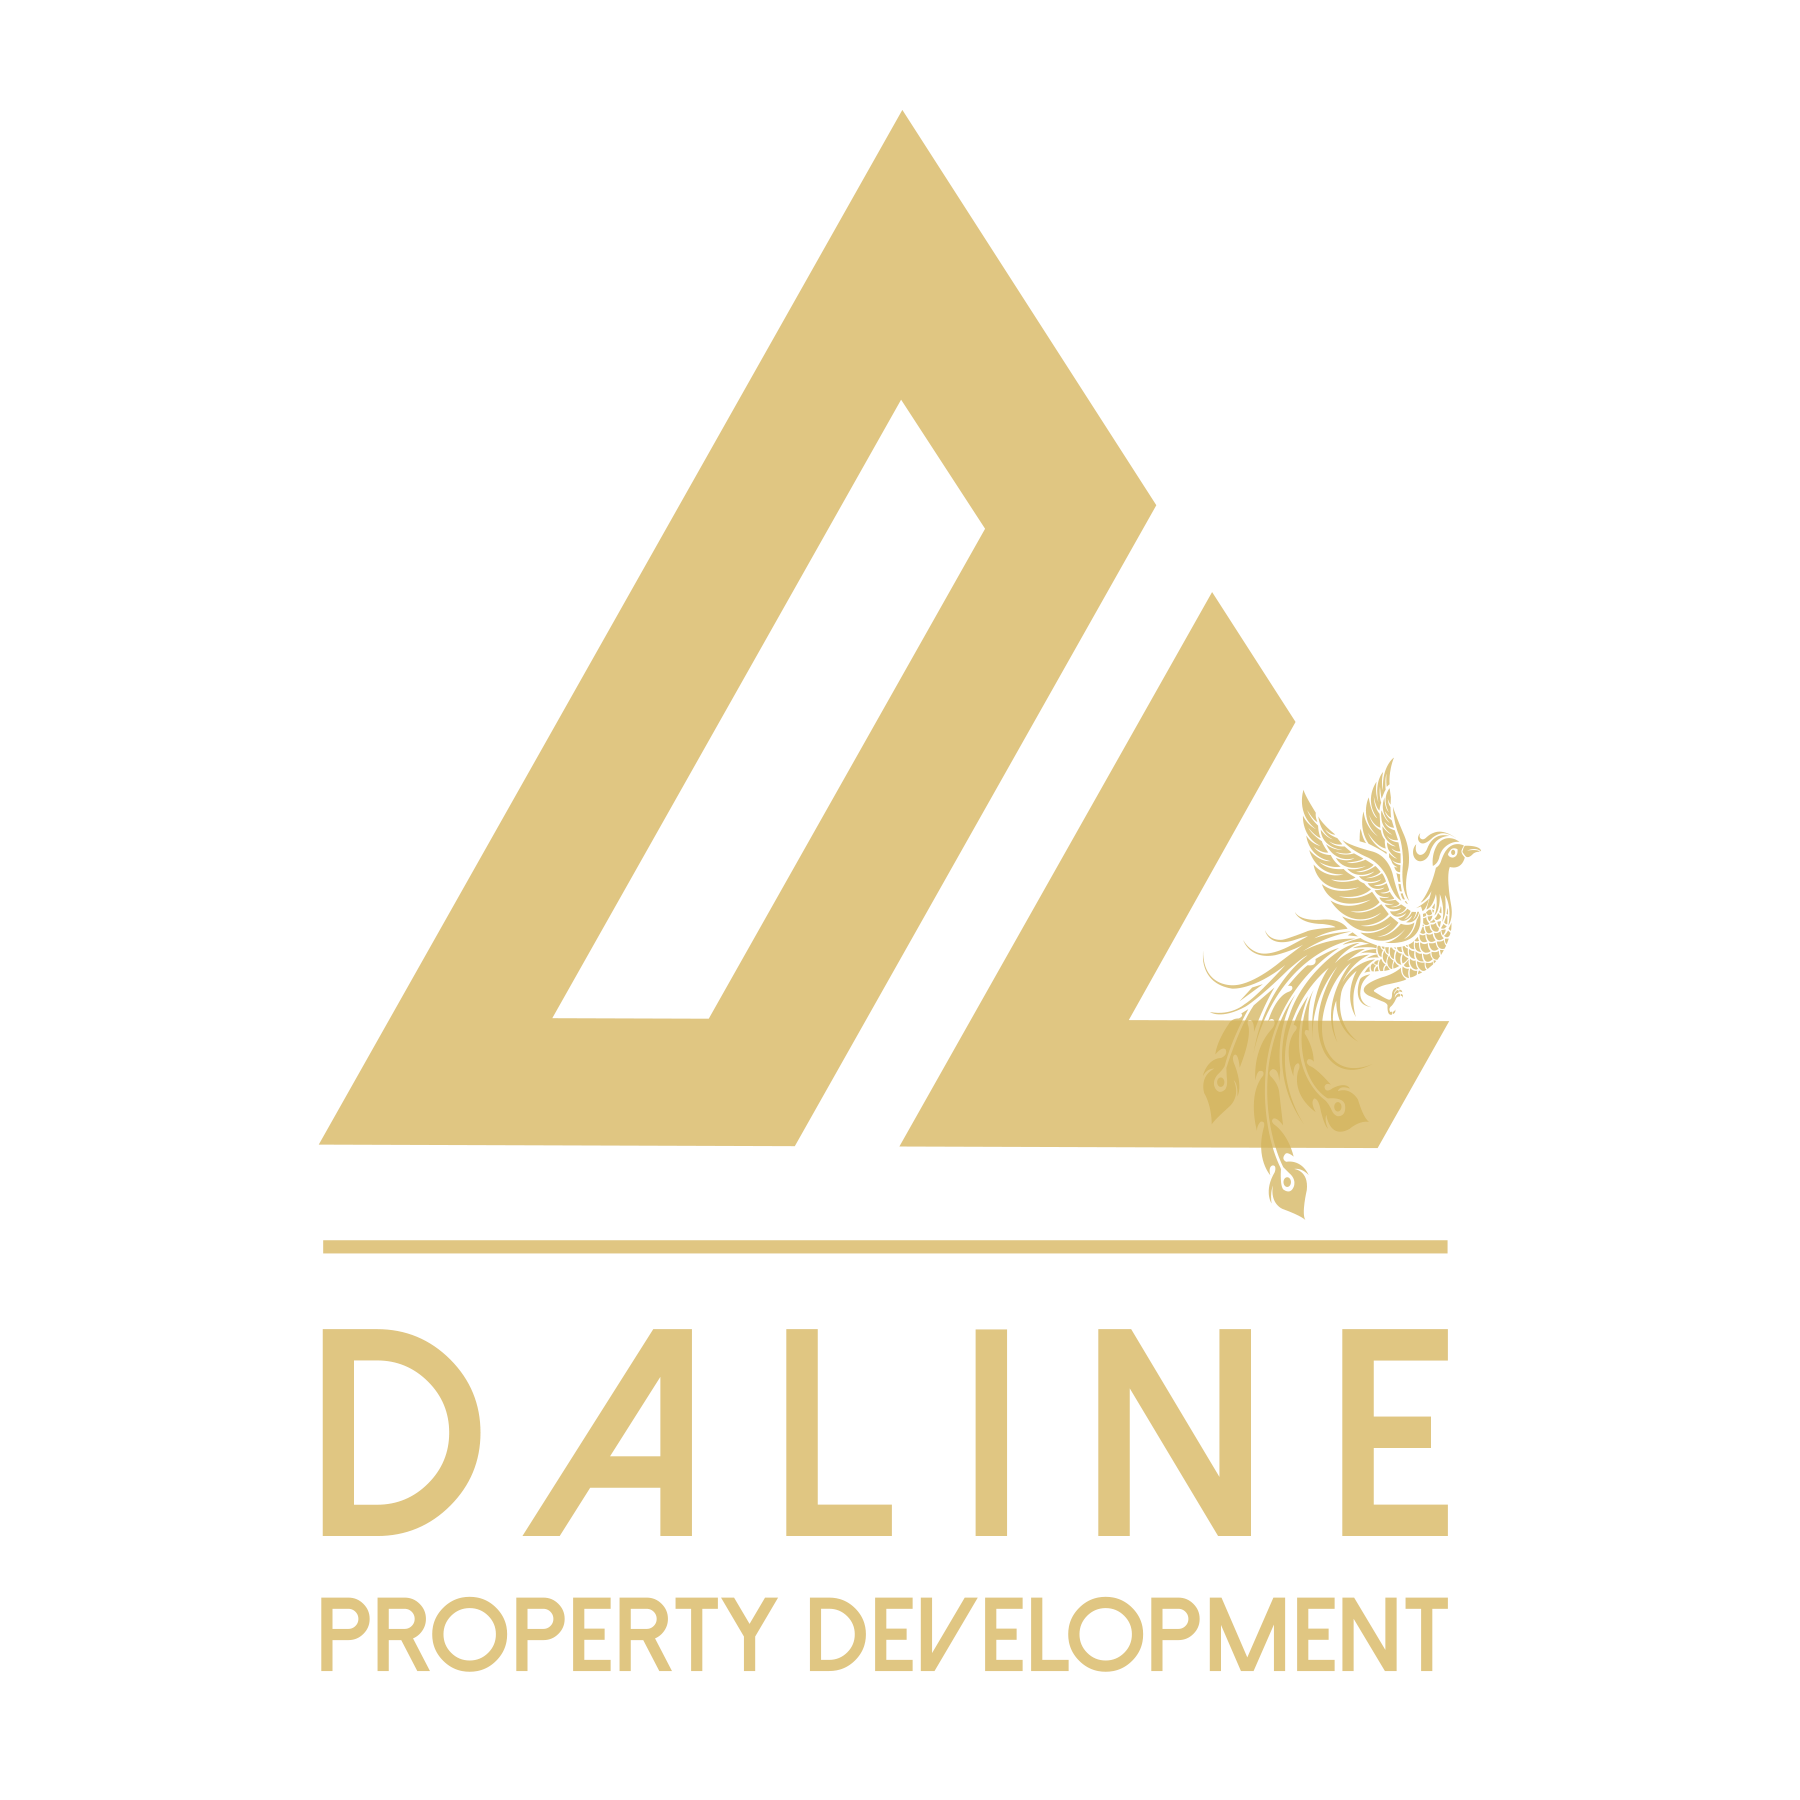 Daline Property